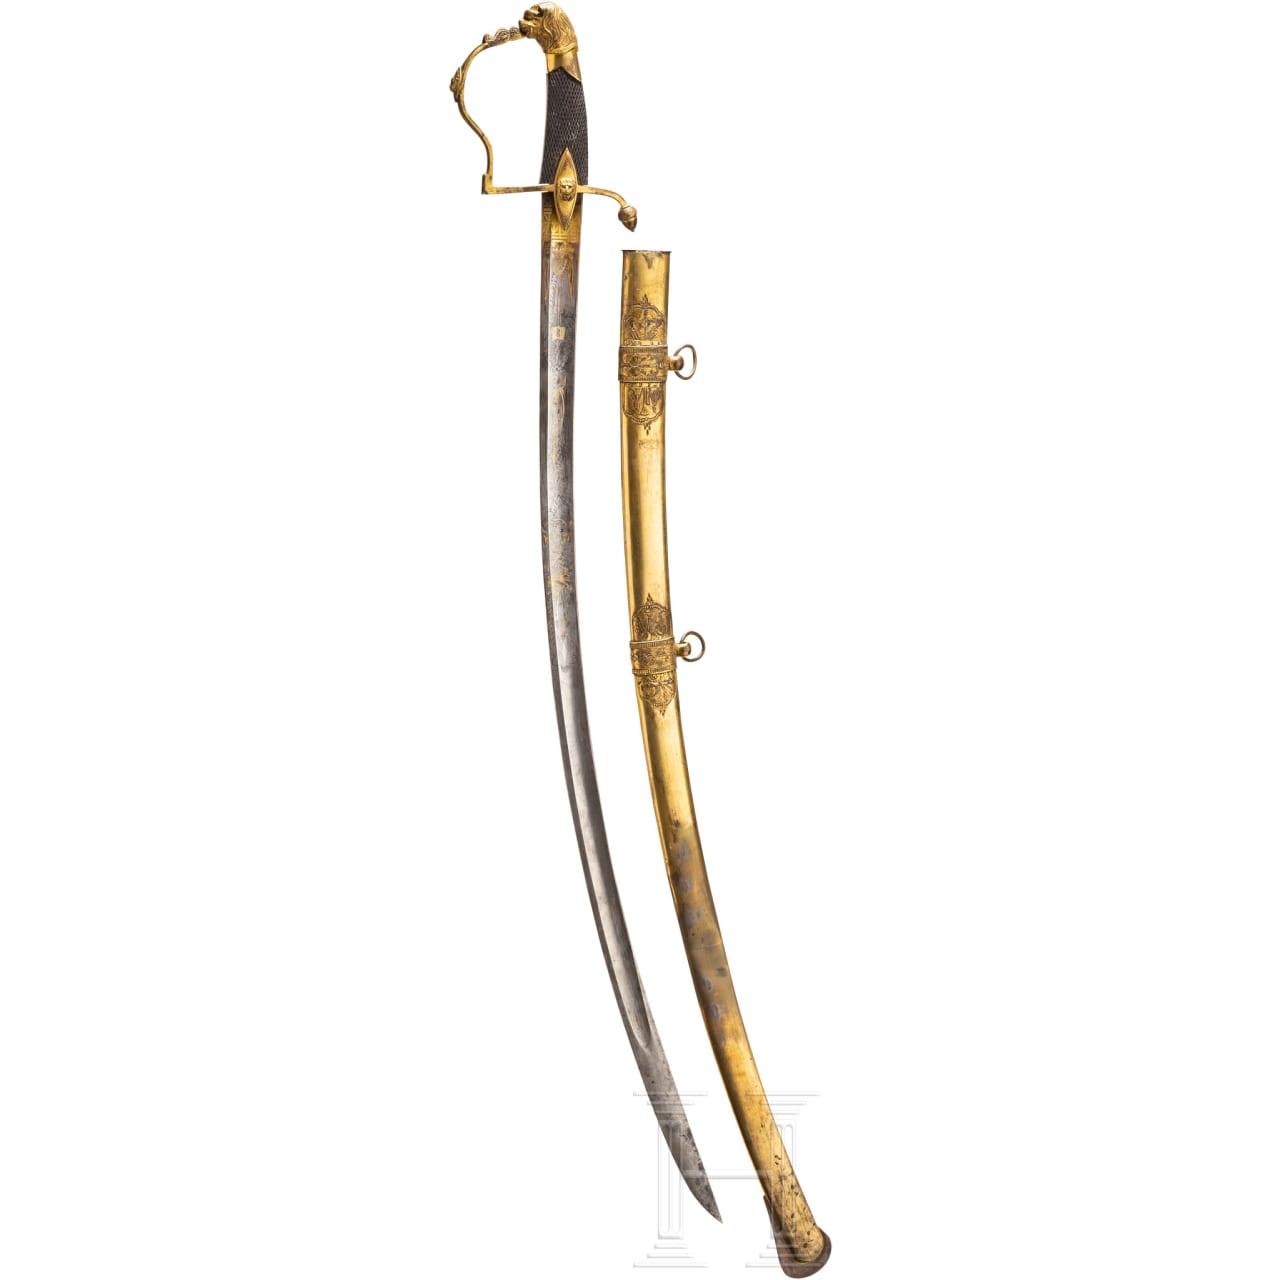 A German officer's sabre, circa 1830